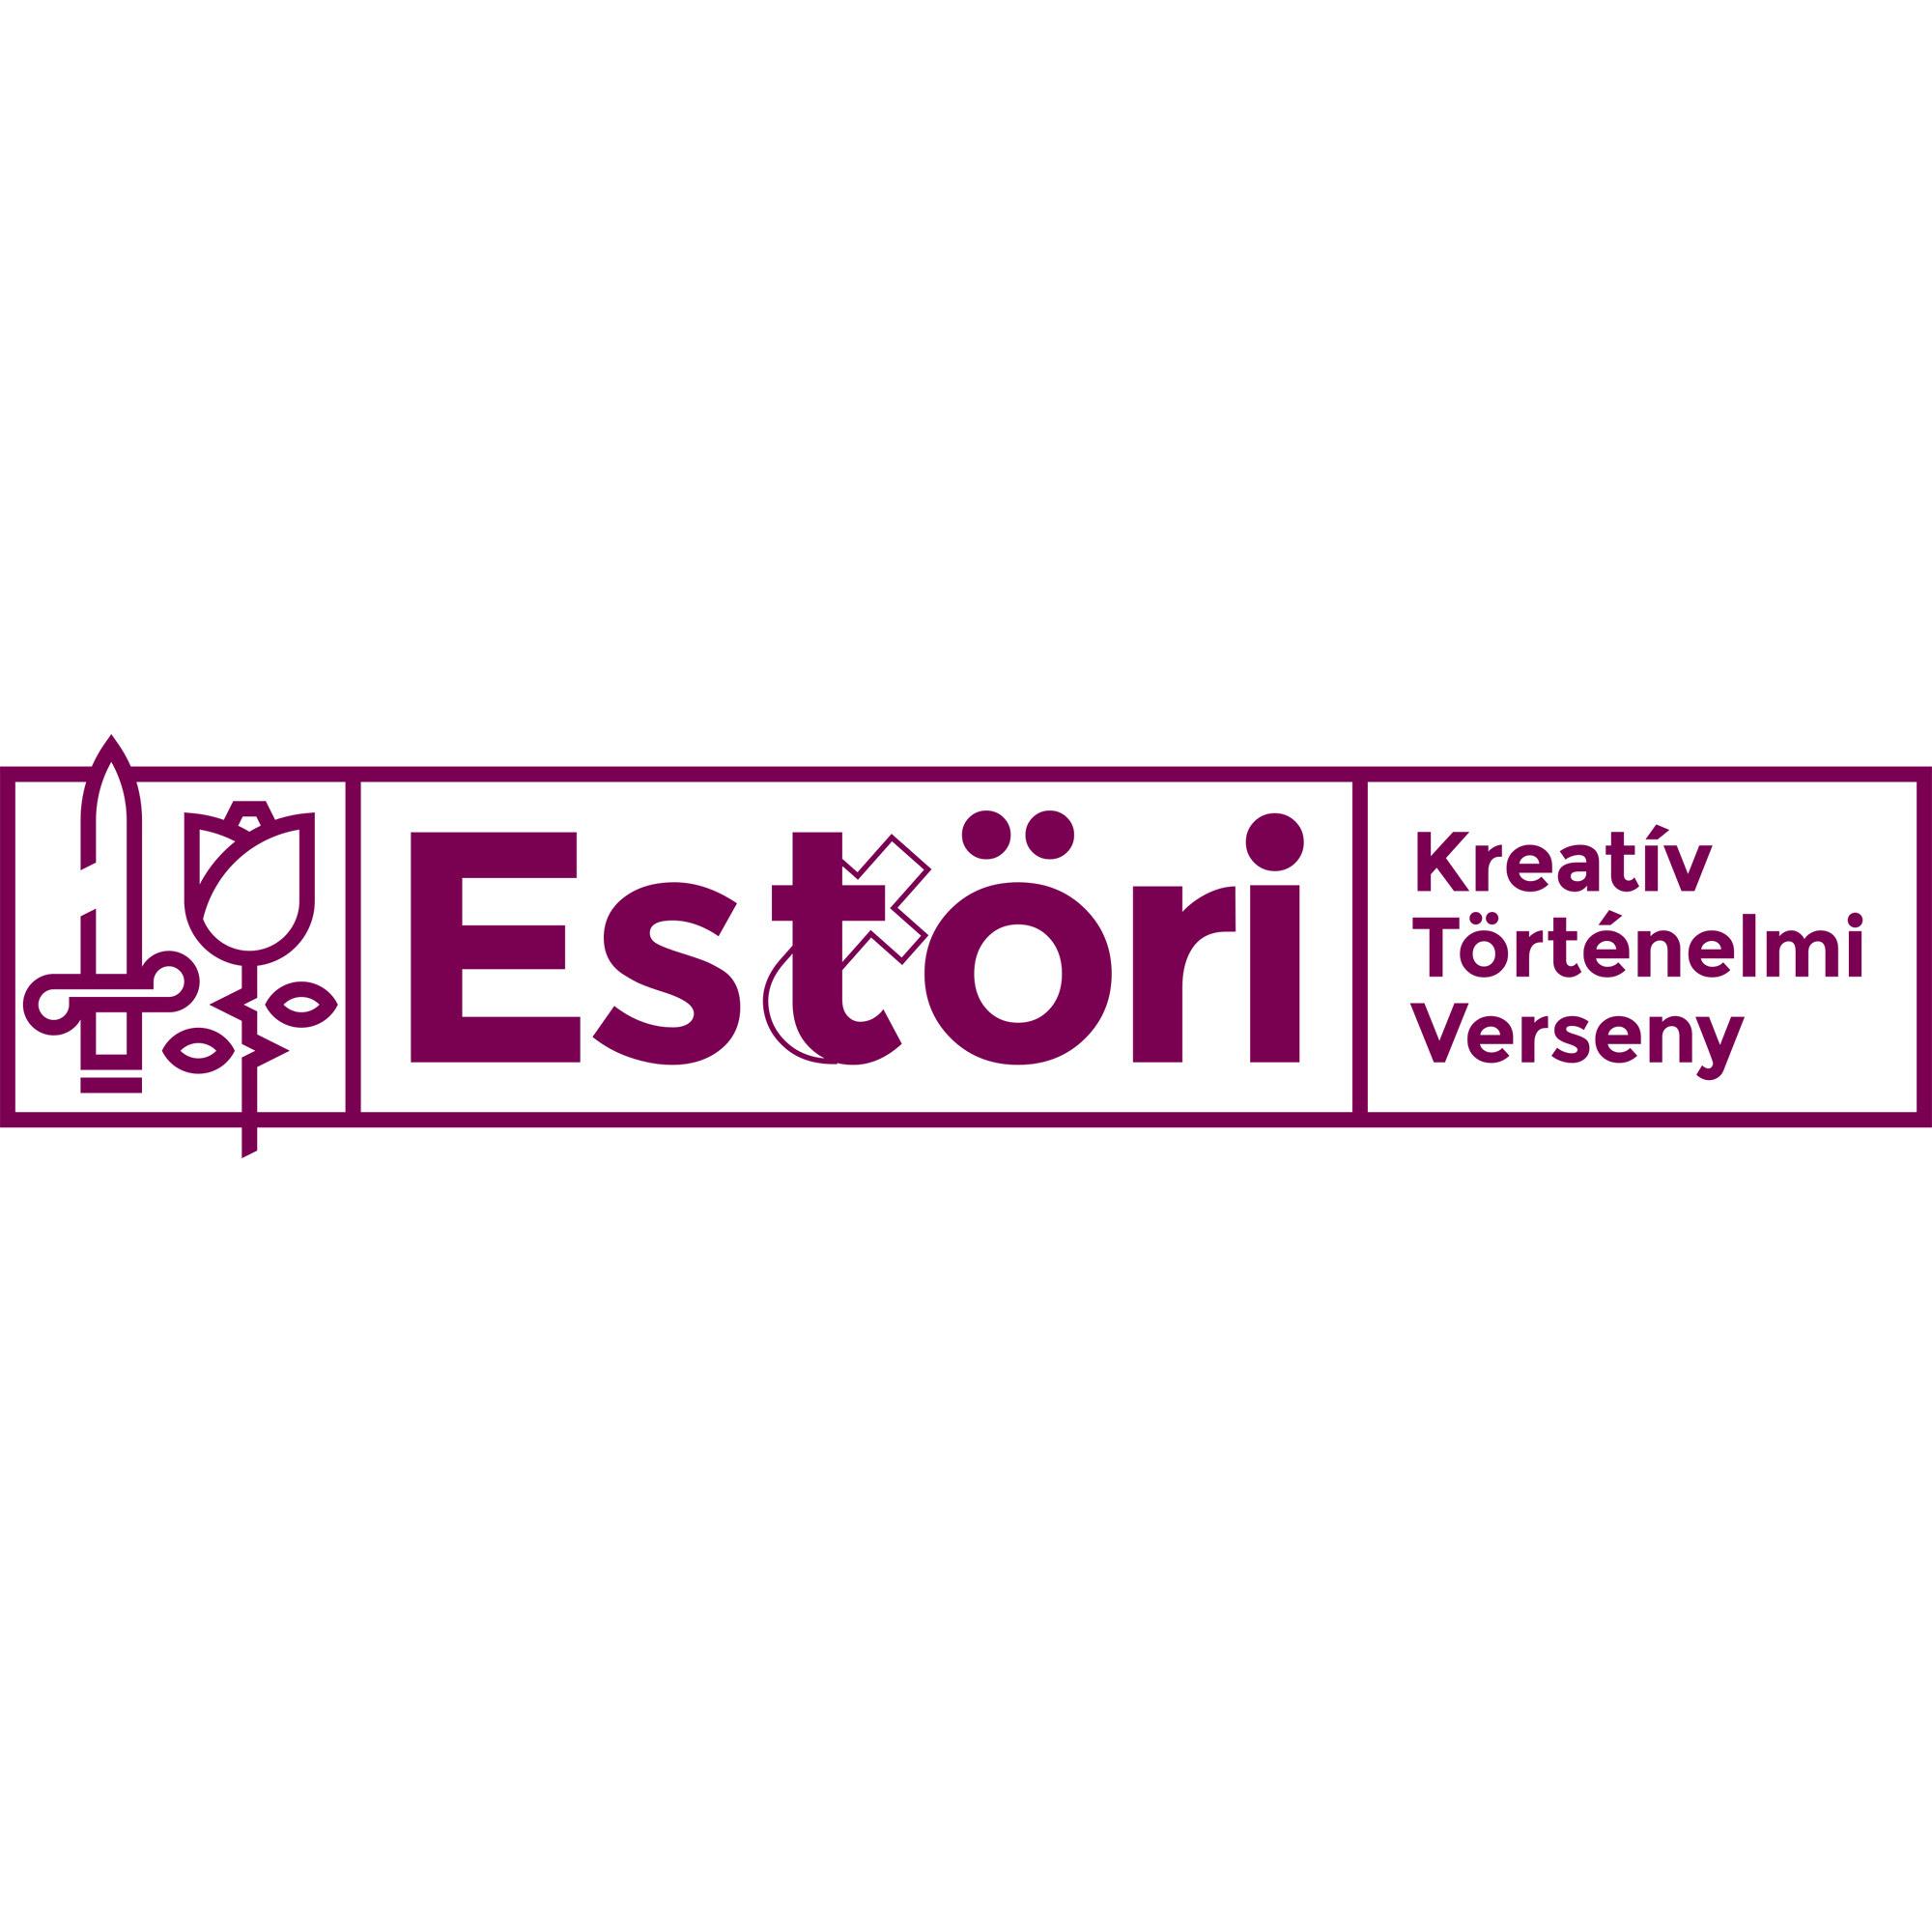 estori_2000x2000